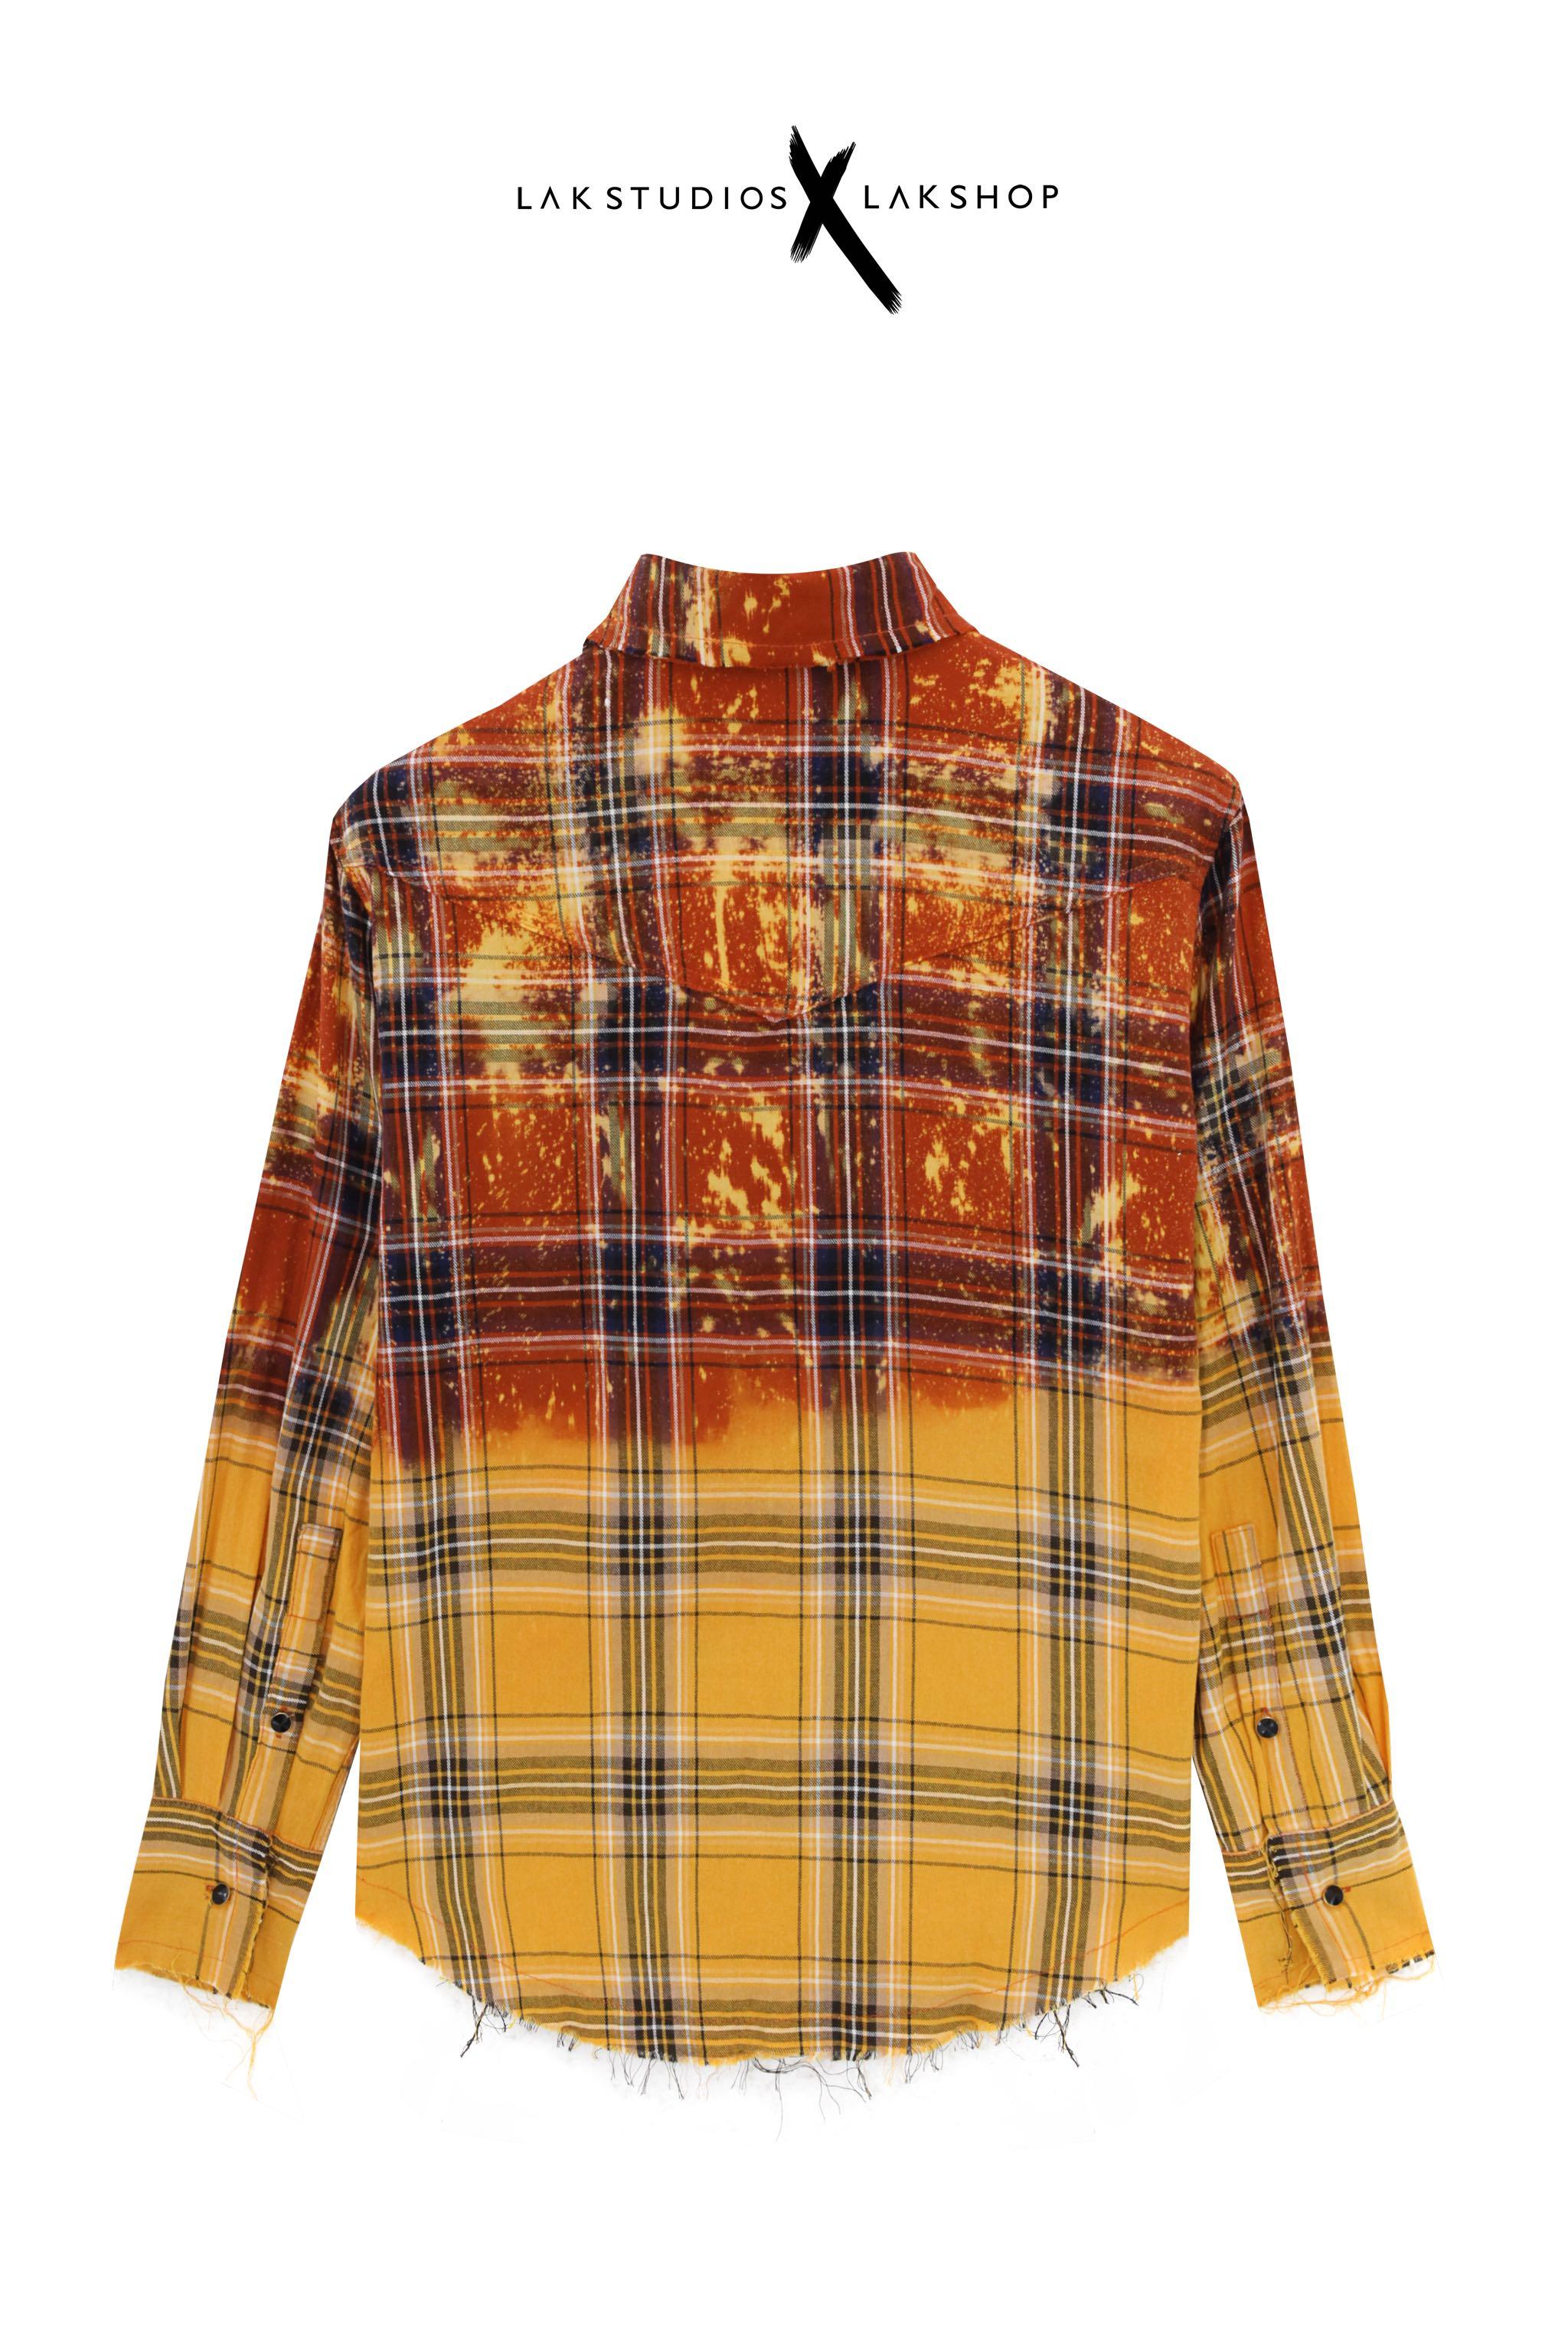 Lak Studios White Glitter Tweed Shirt Jacket